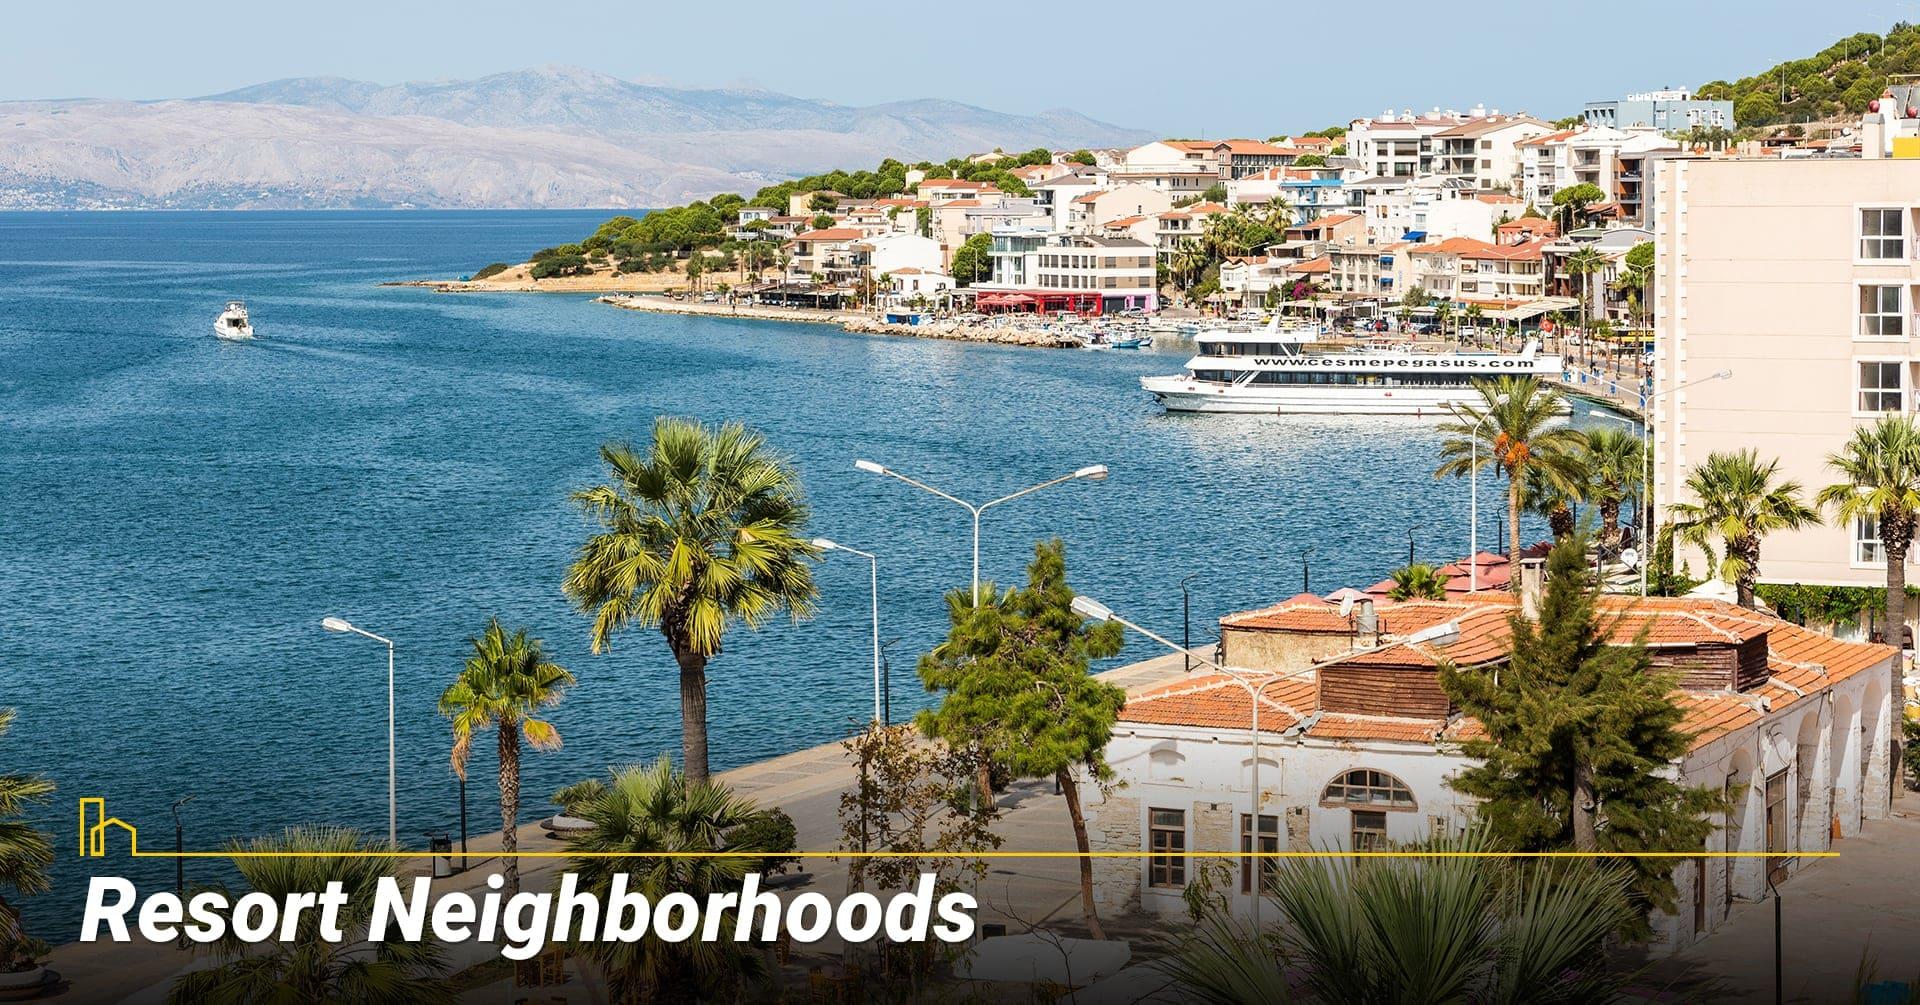 Resort Neighborhoods, waterfront neighborhoods